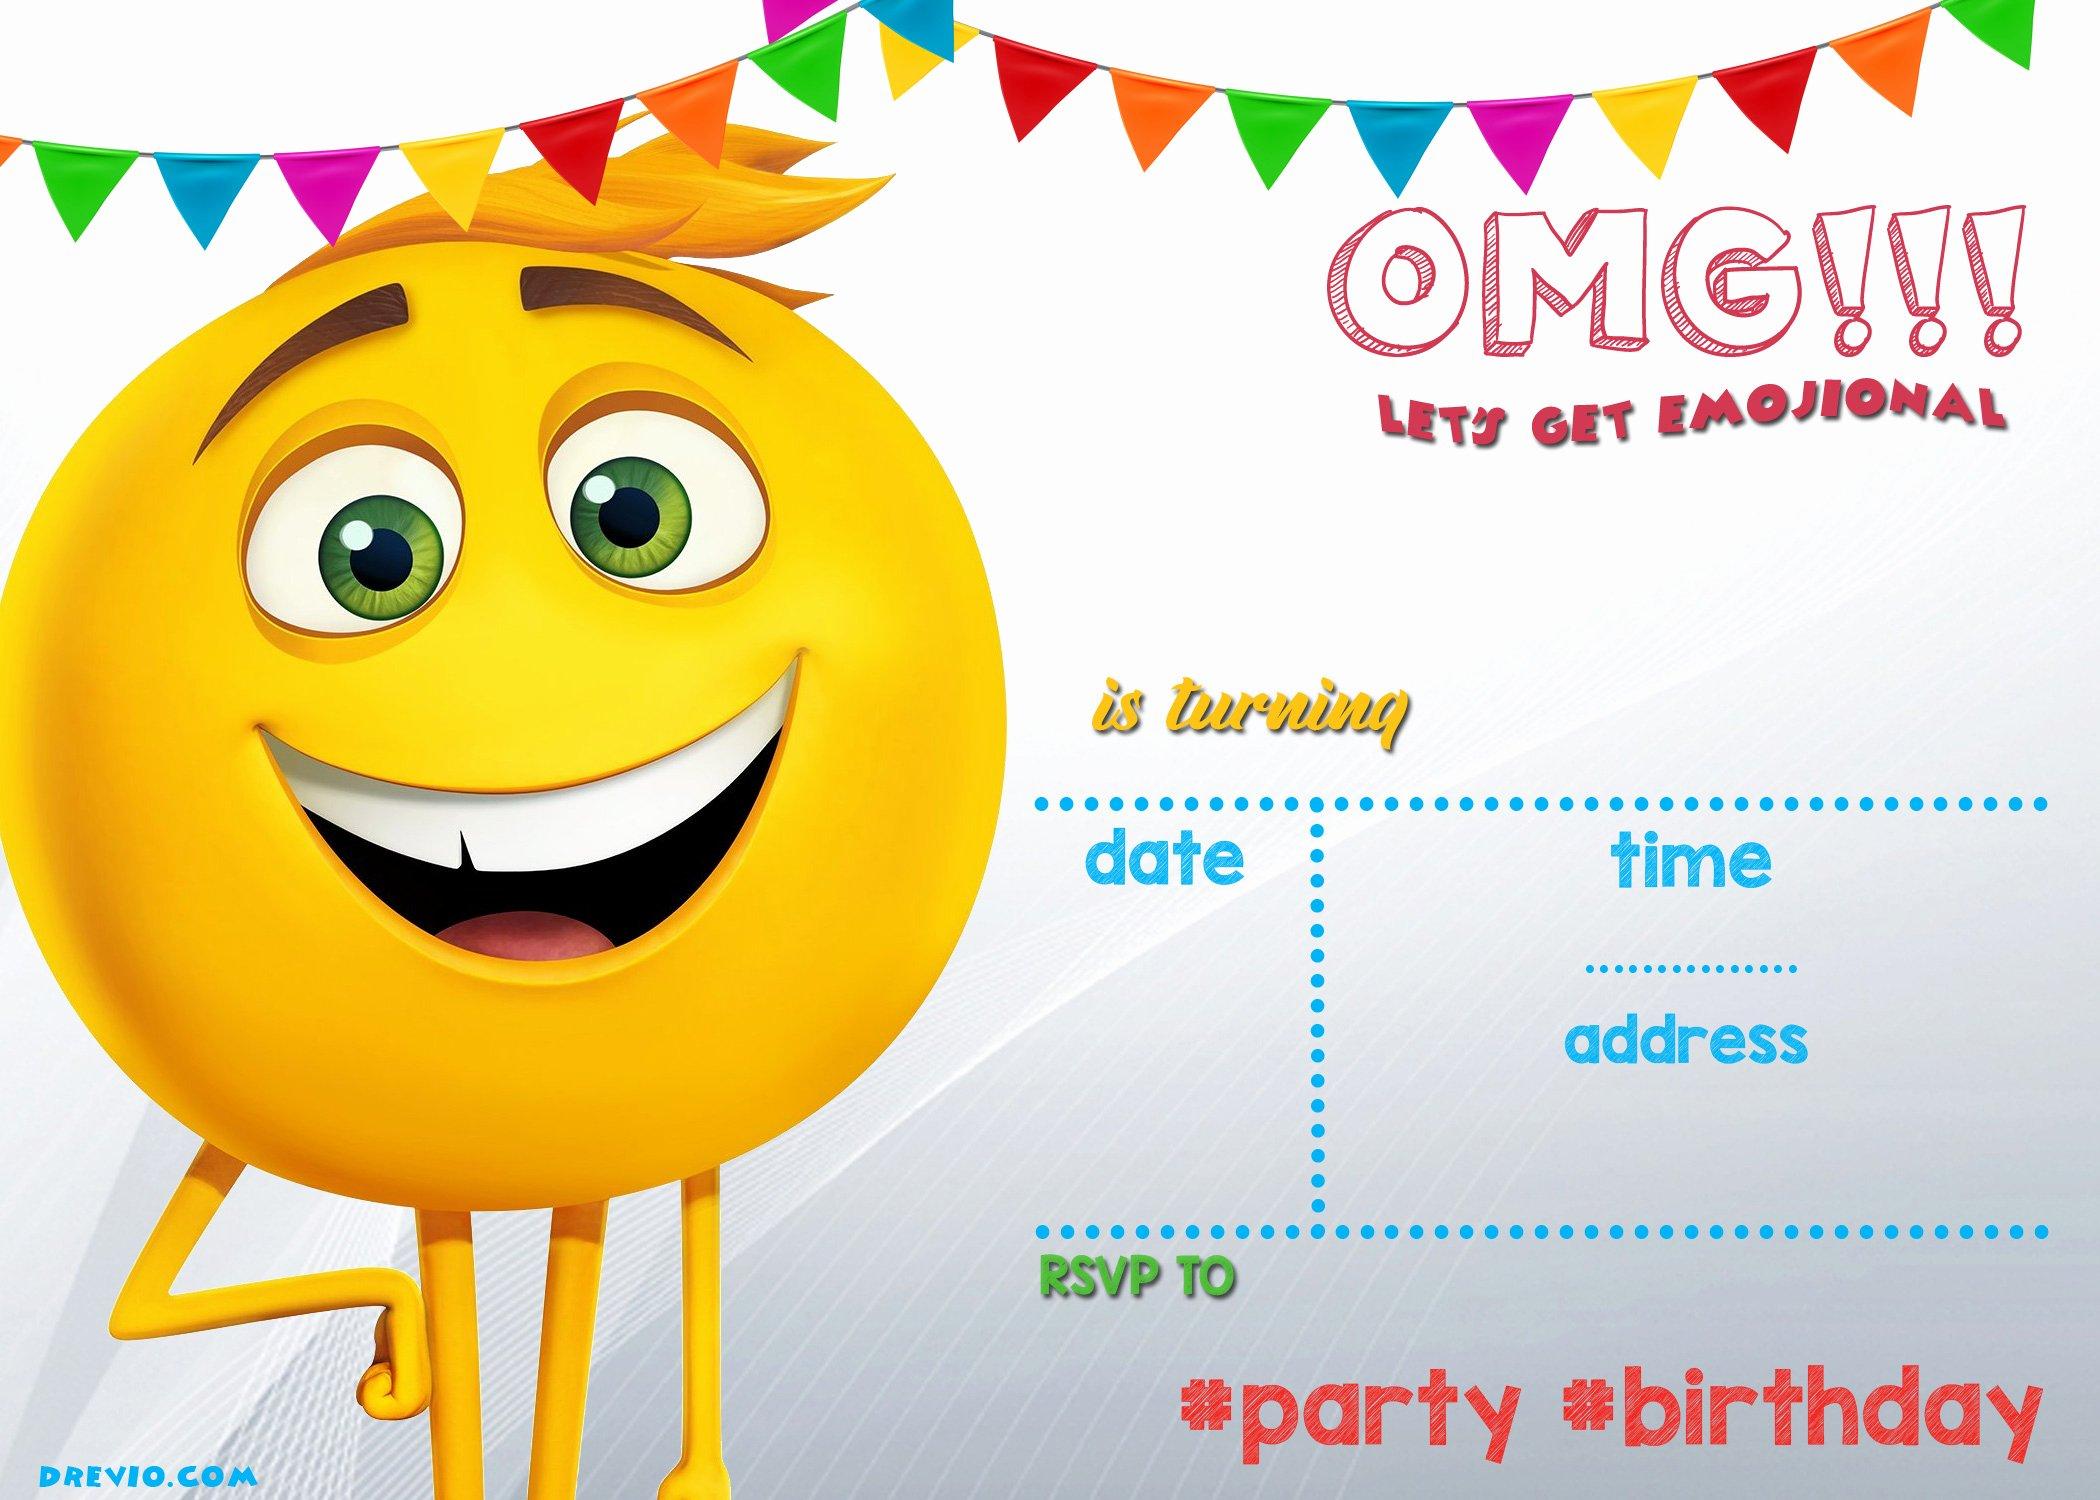 Emoji Invitation Template Free New Free Printable Emoji Invitation Template